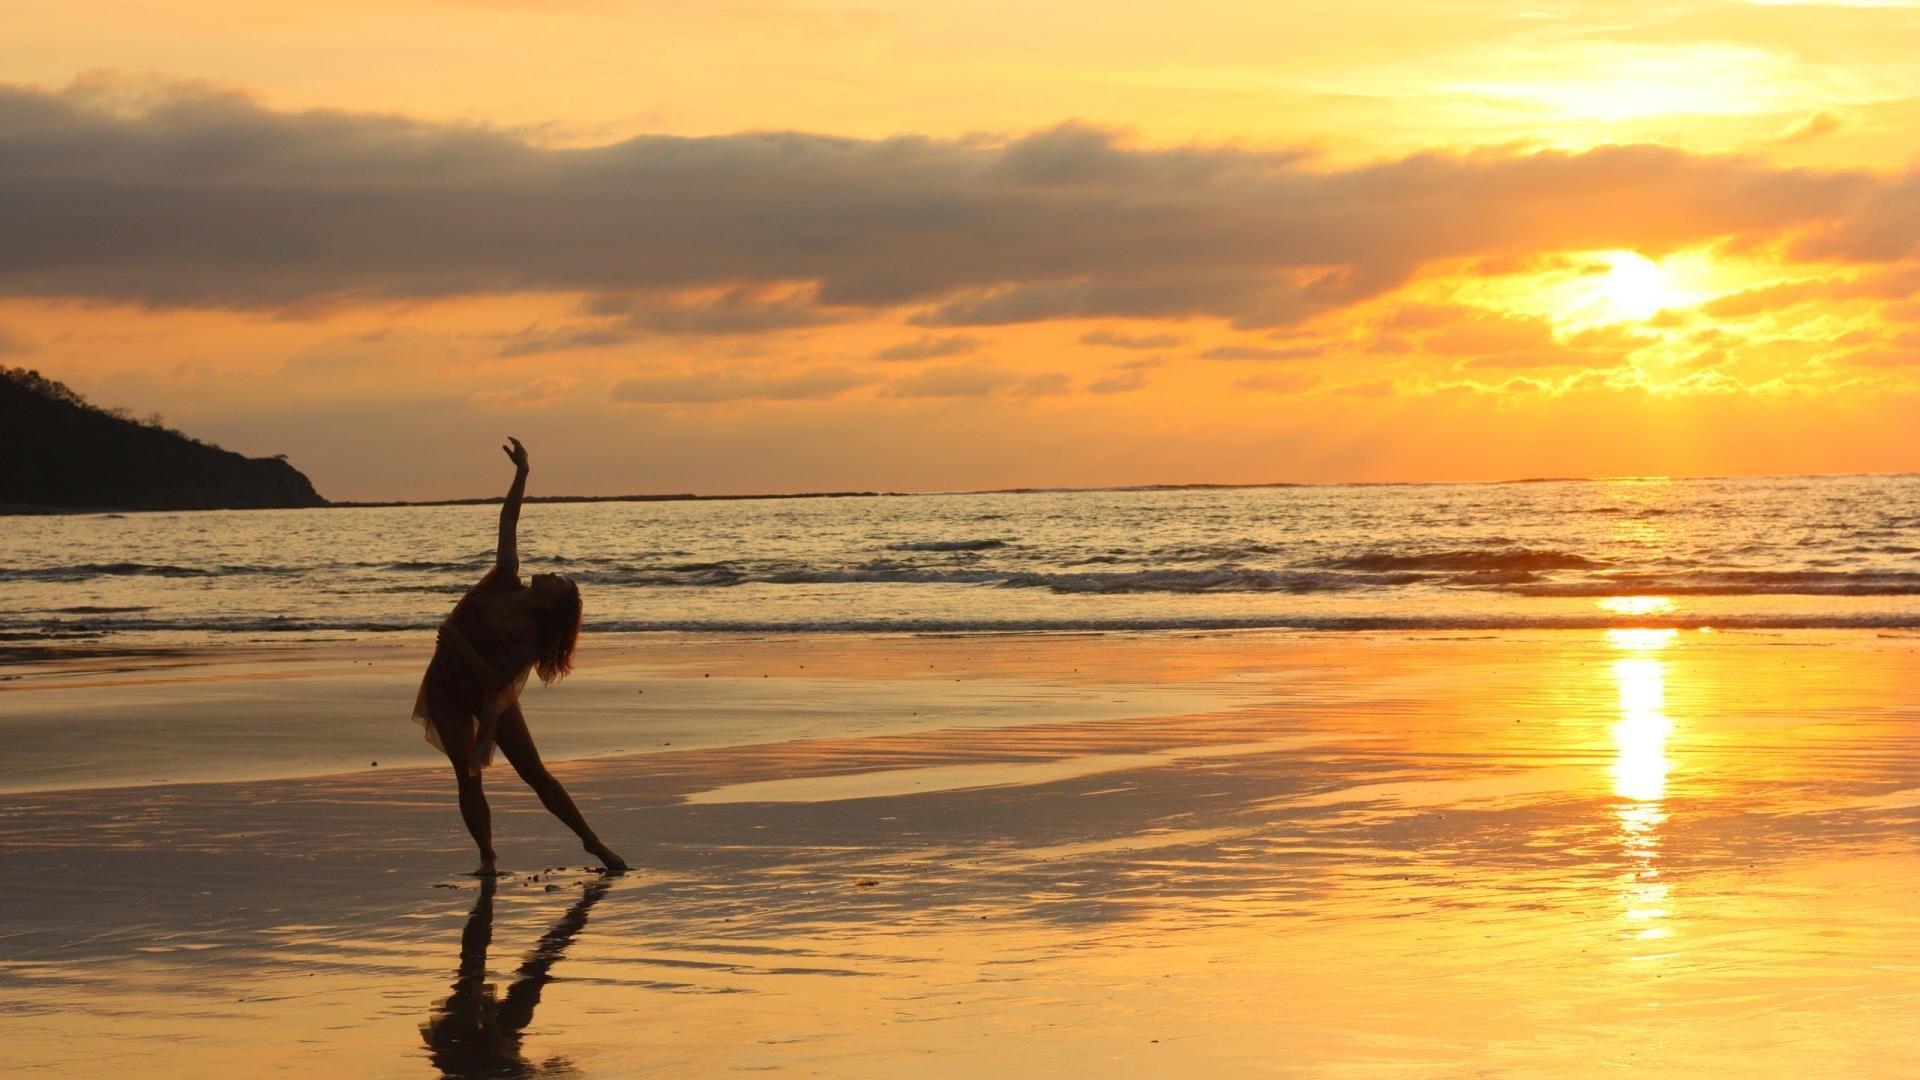 1920x1200 Sea Beach Sunset Hd Widescreen New Wallpaper Desktop Background Image Free Full Download High Resolution Photos